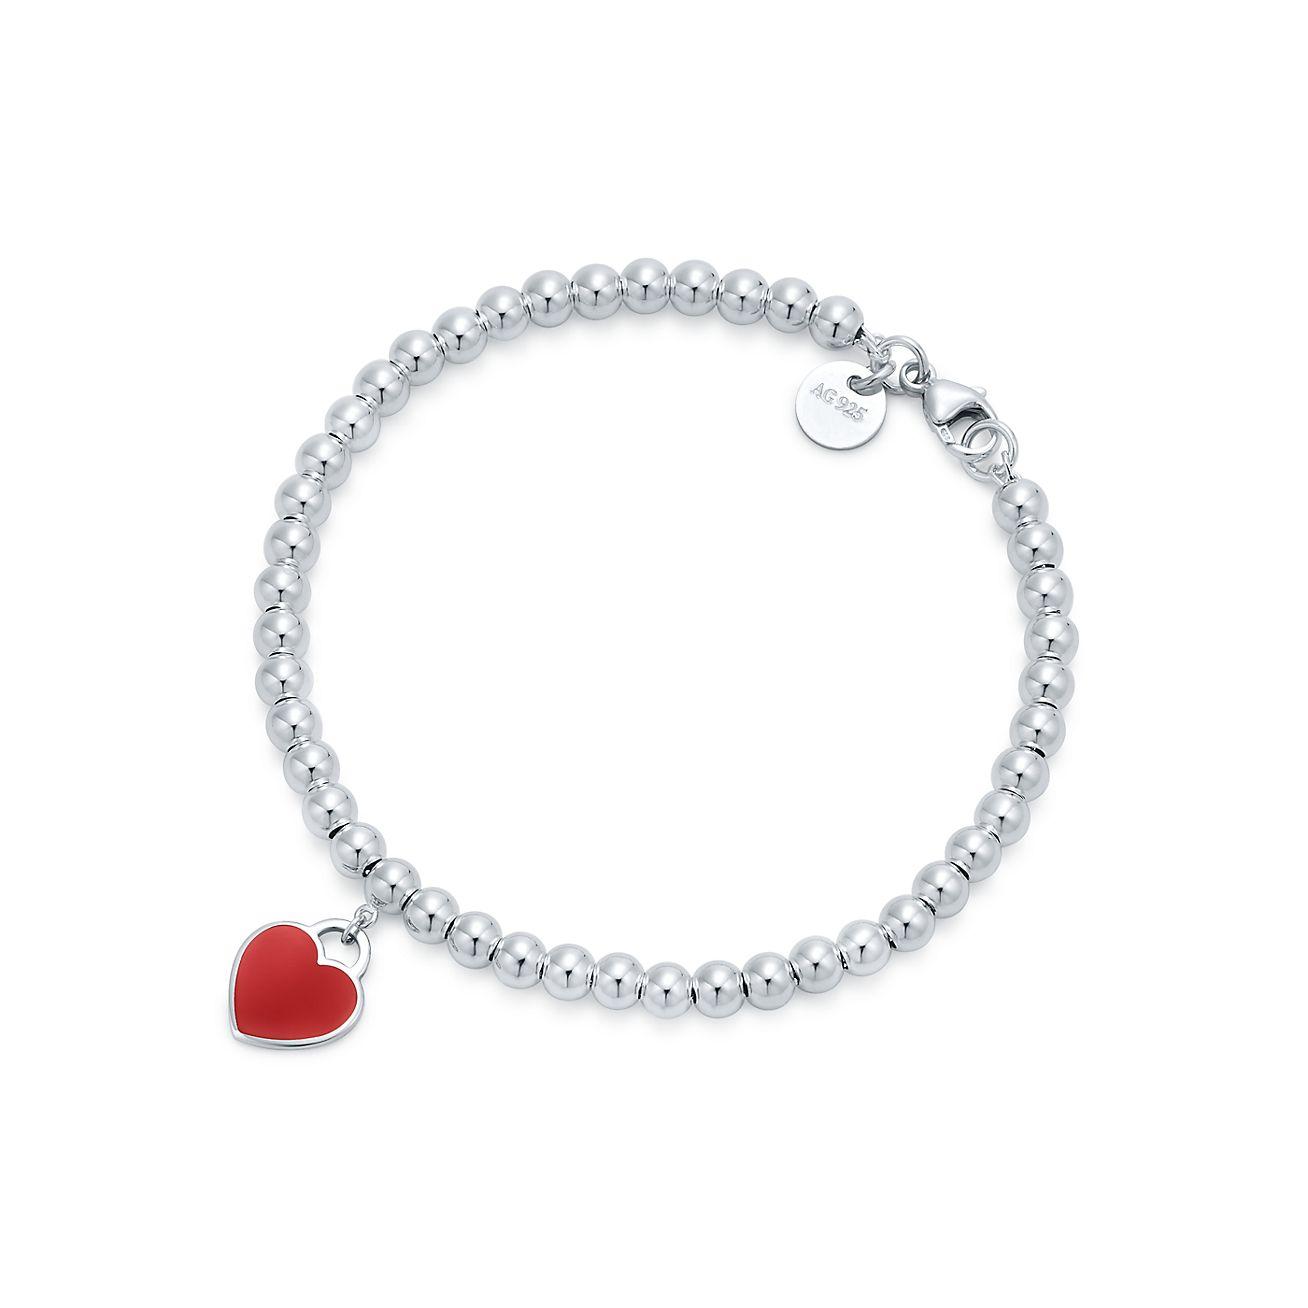 Bracelet de perles Return to Tiffany™, argent 925 mil, fini émail rouge.  Medium.